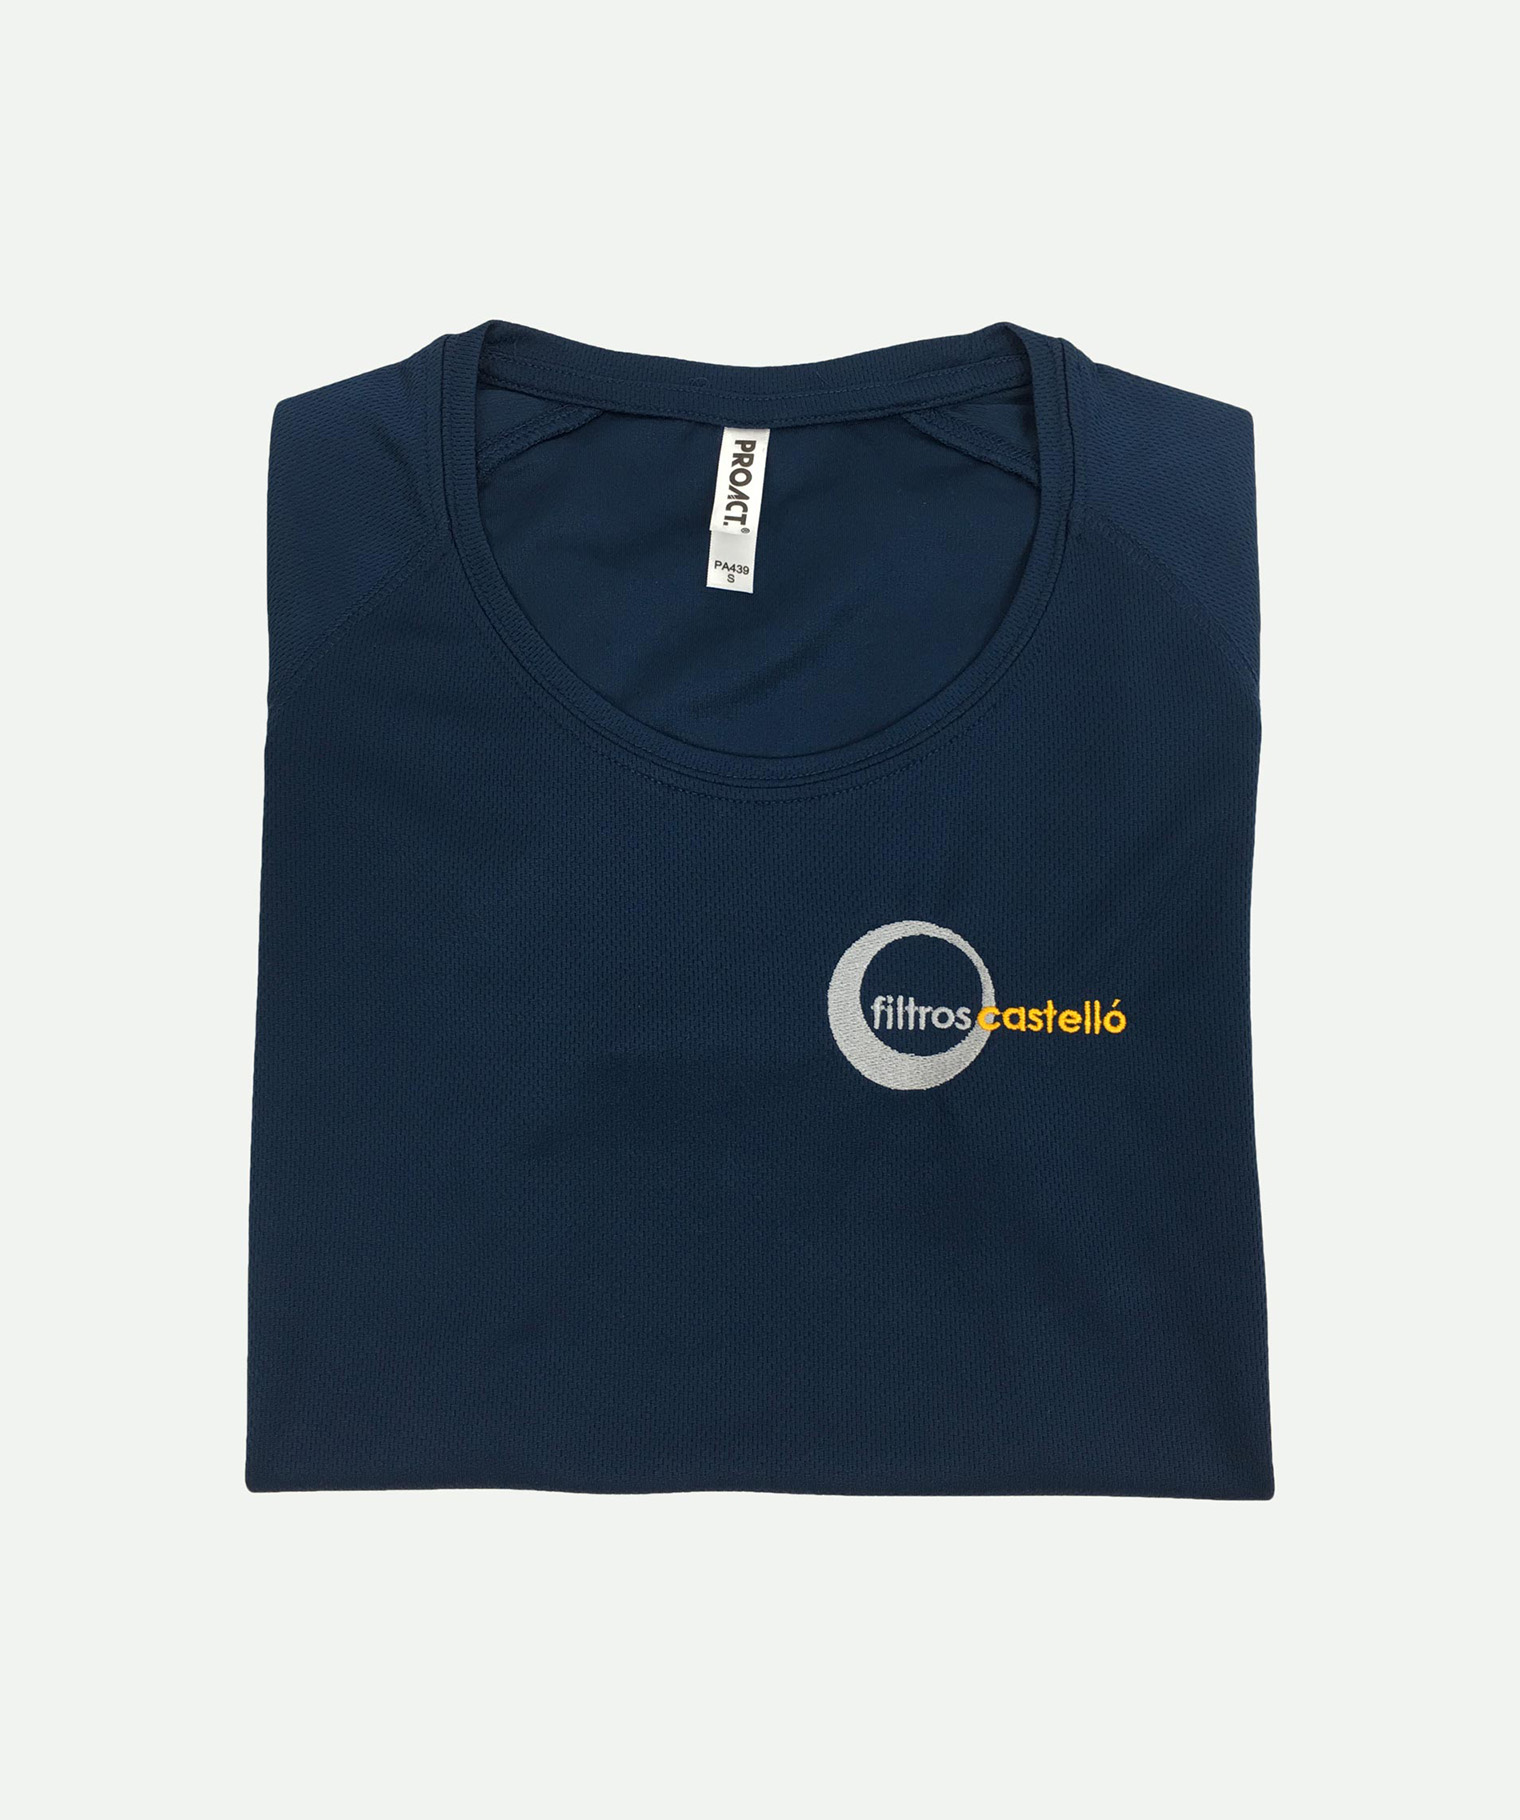 Camiseta bordada técnica marino